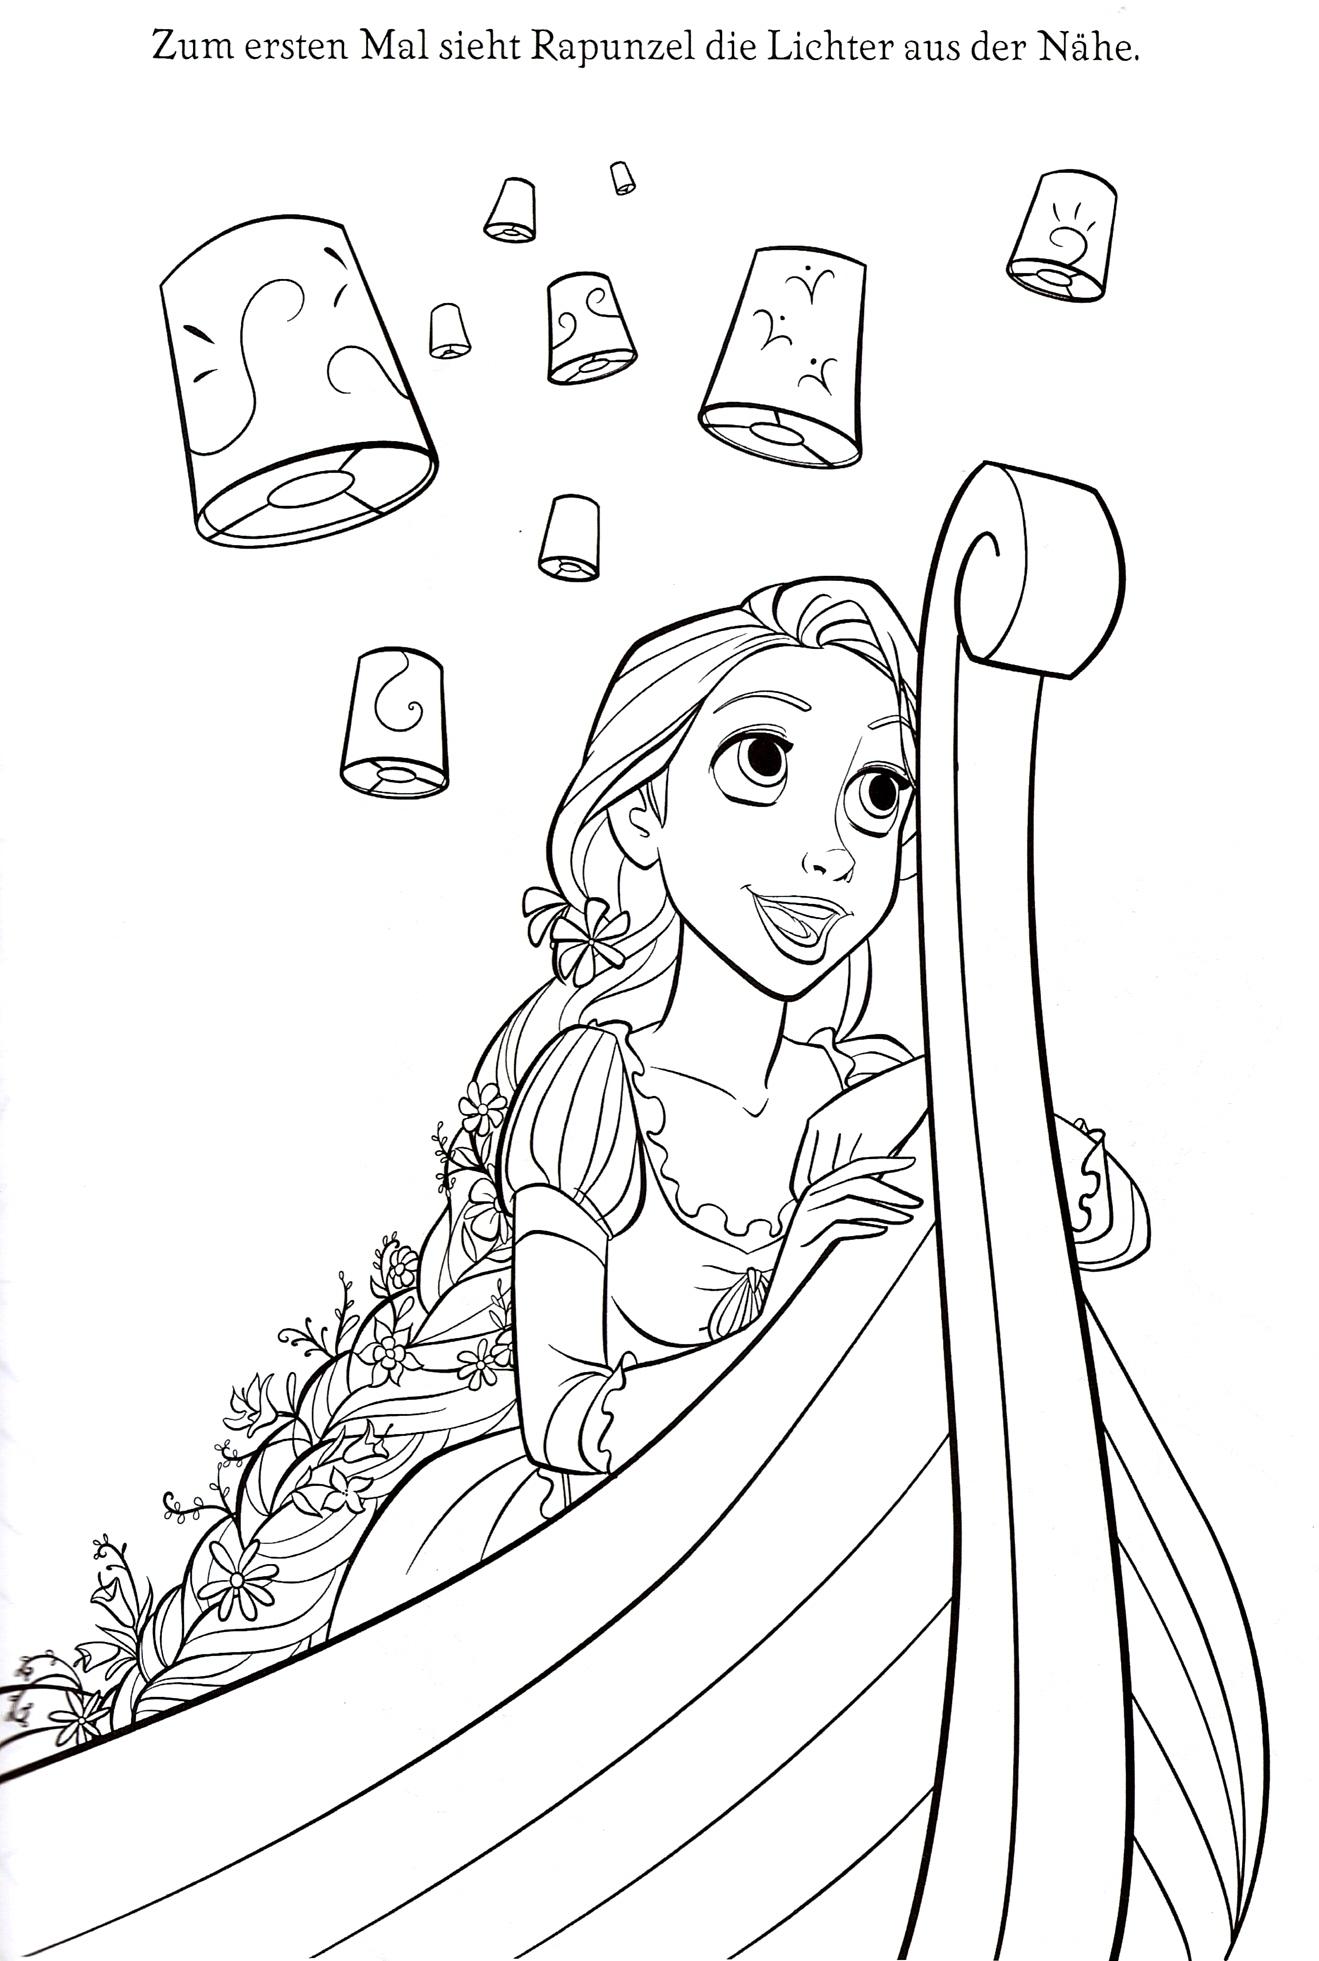 Rapunzel_coloring_book2_046.jpg